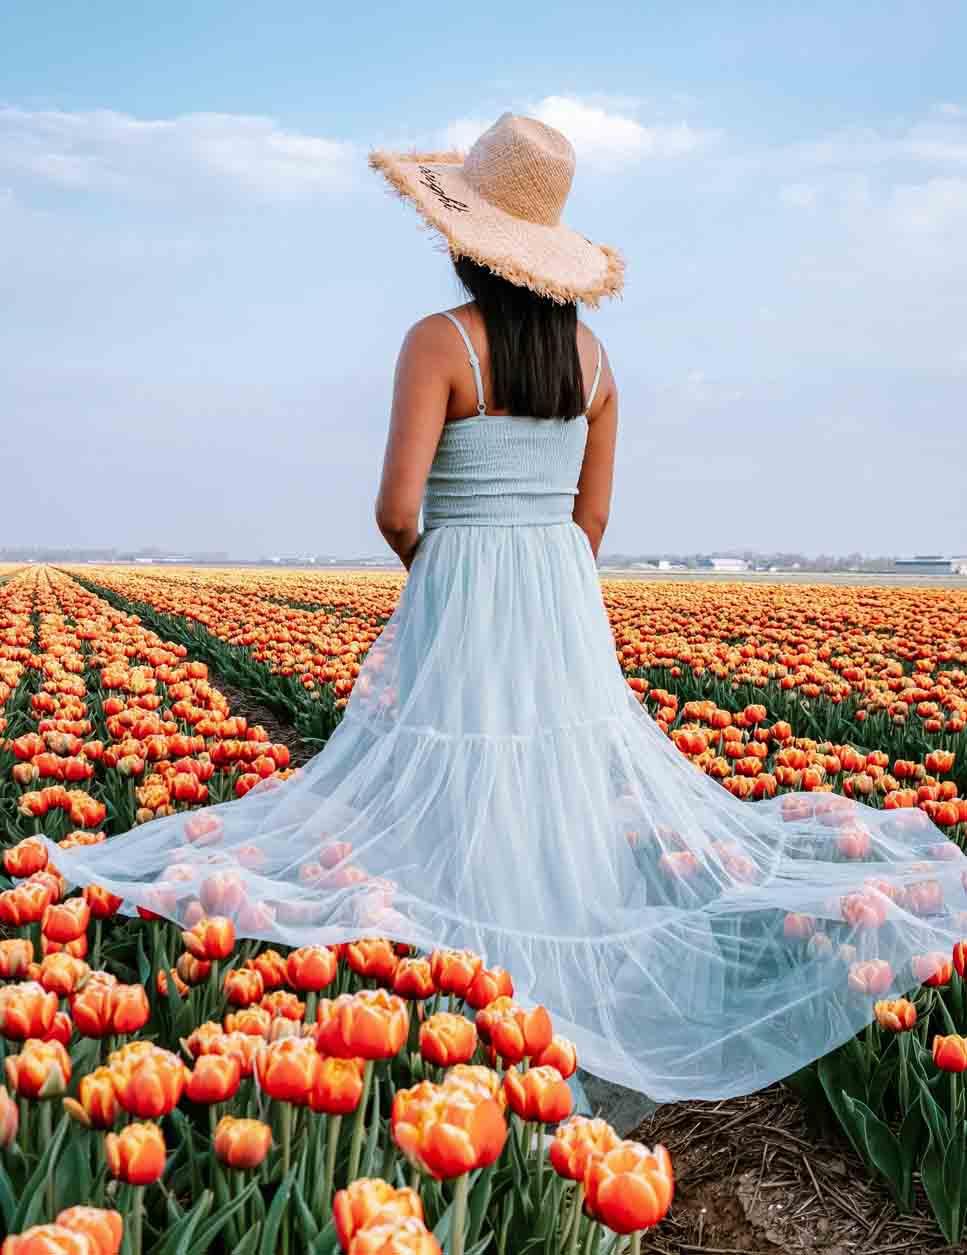 Холст с красками 17х22 по номер. в кор. (14цв.) Девушка в поле тюльпанов (Арт. ХК-8142)